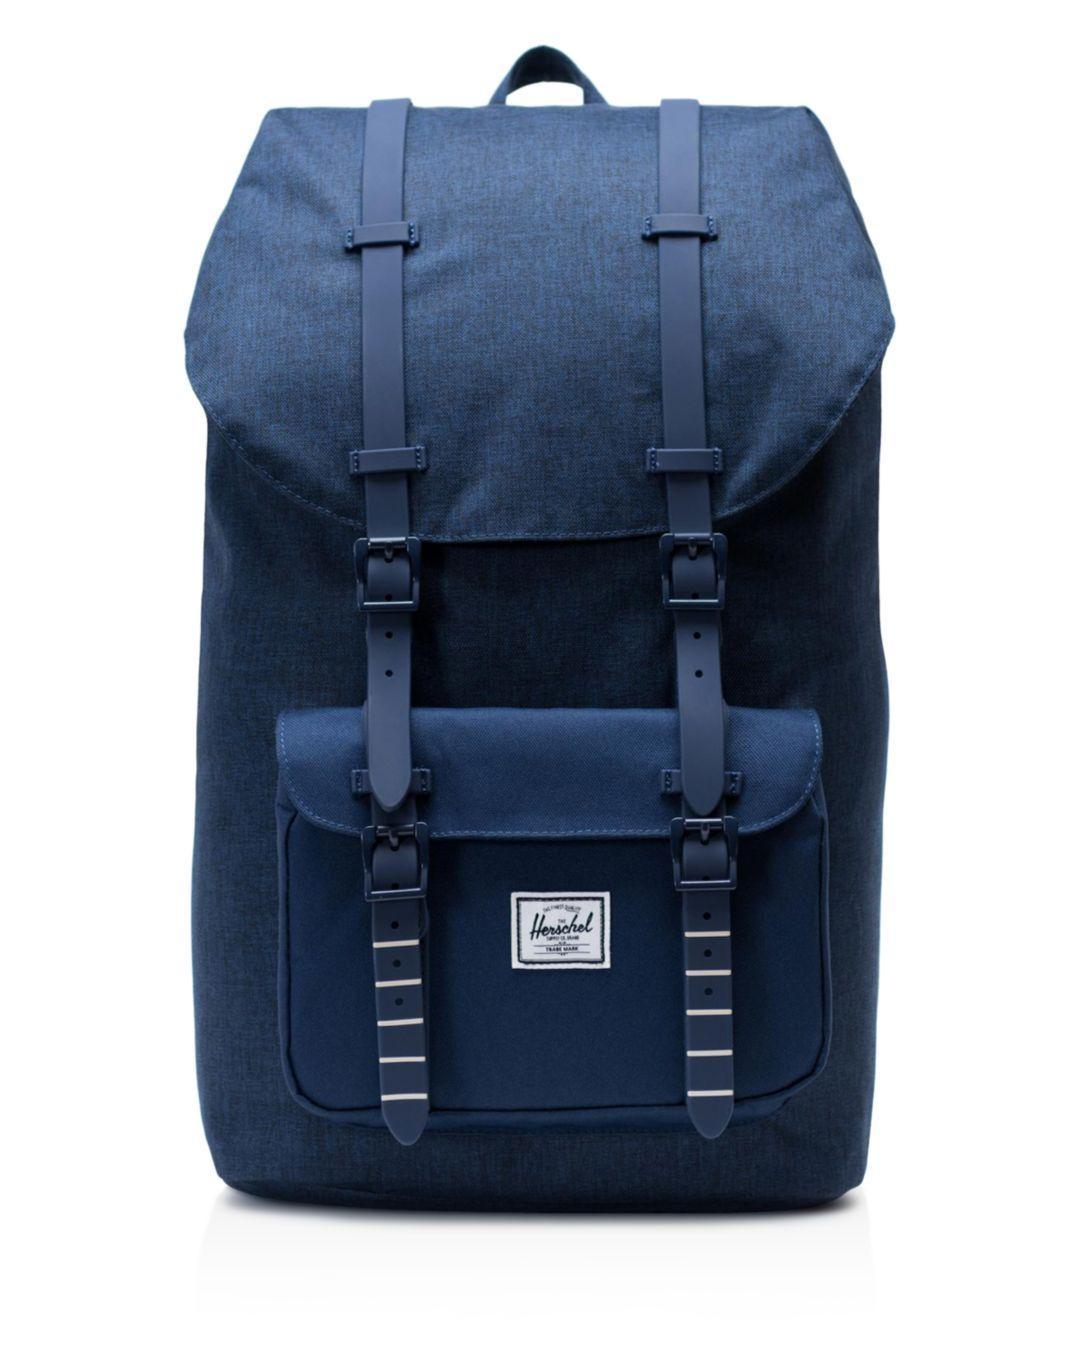 7662bc8bb4 Lyst - Herschel Supply Co. Little America Backpack in Blue for Men ...